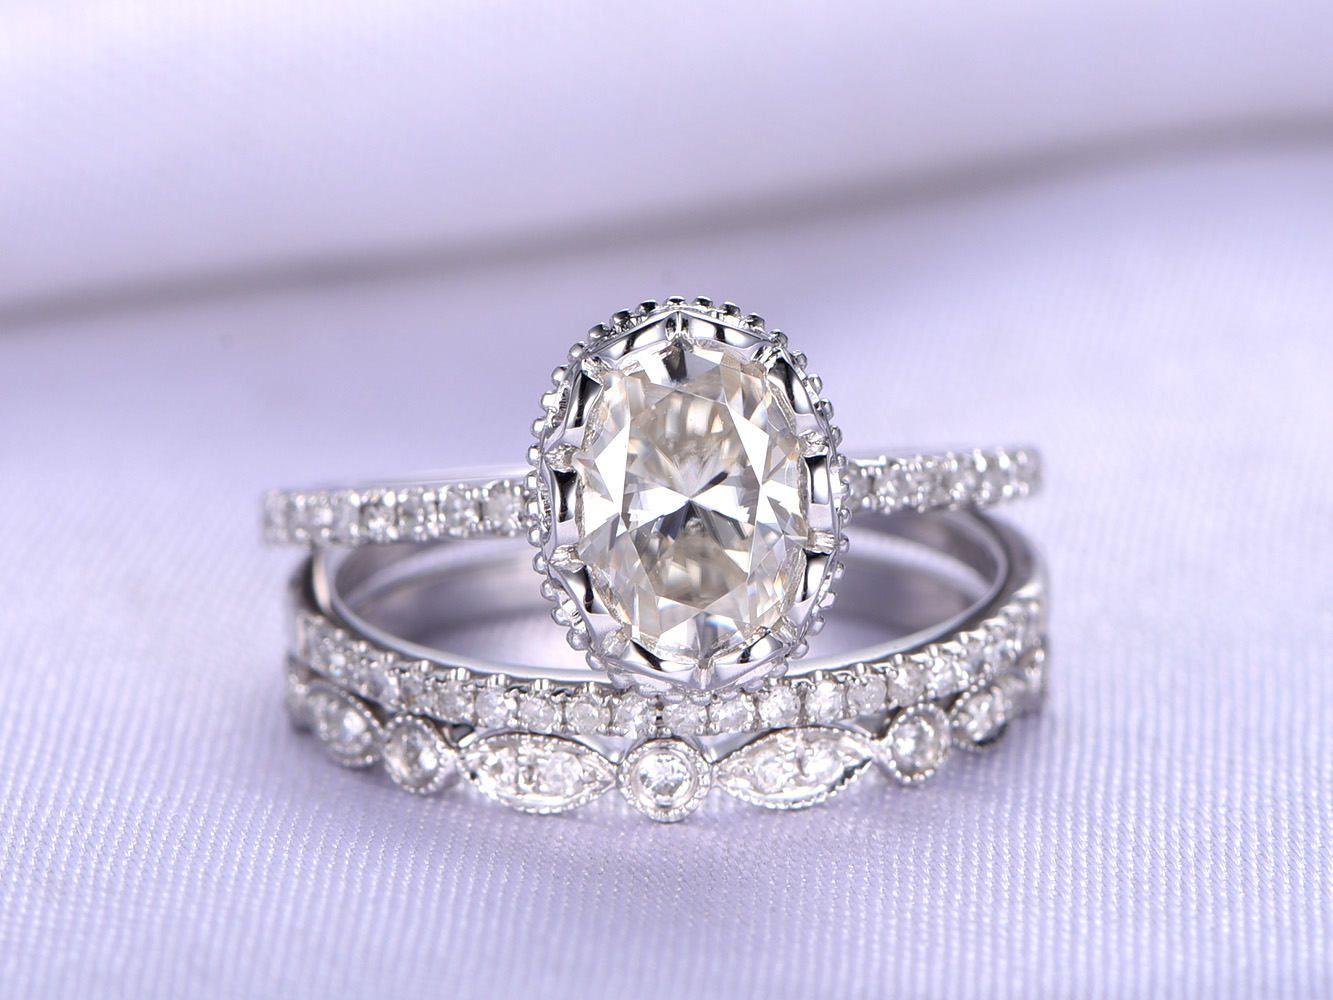 Wedding ring setmoissanite engagement ringxmm oval cut